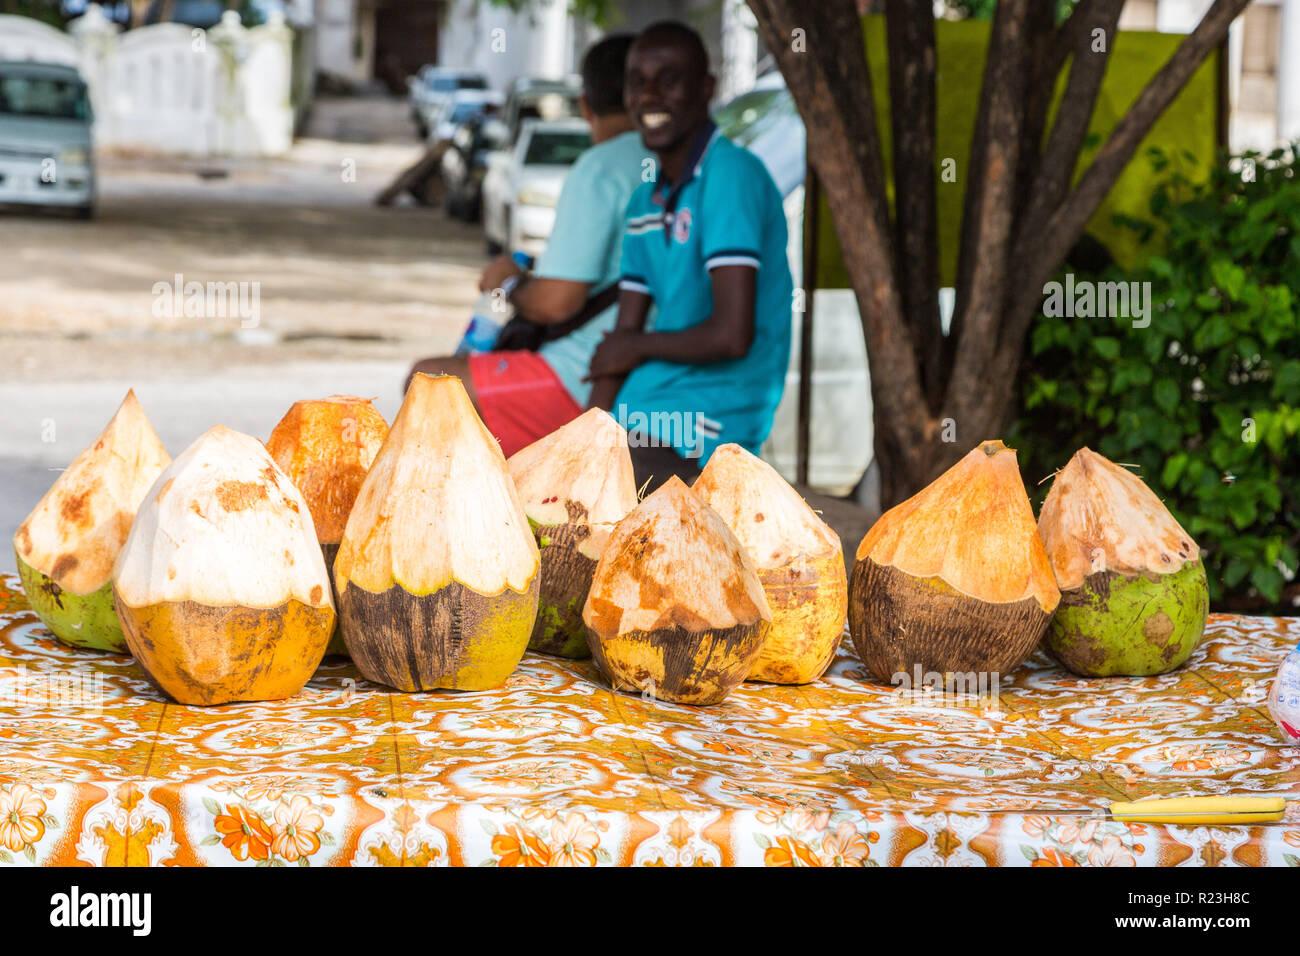 Street vendor of coconuts. Stone Town, old colonial center of Zanzibar City, Unguja island, Tanzania - Stock Image